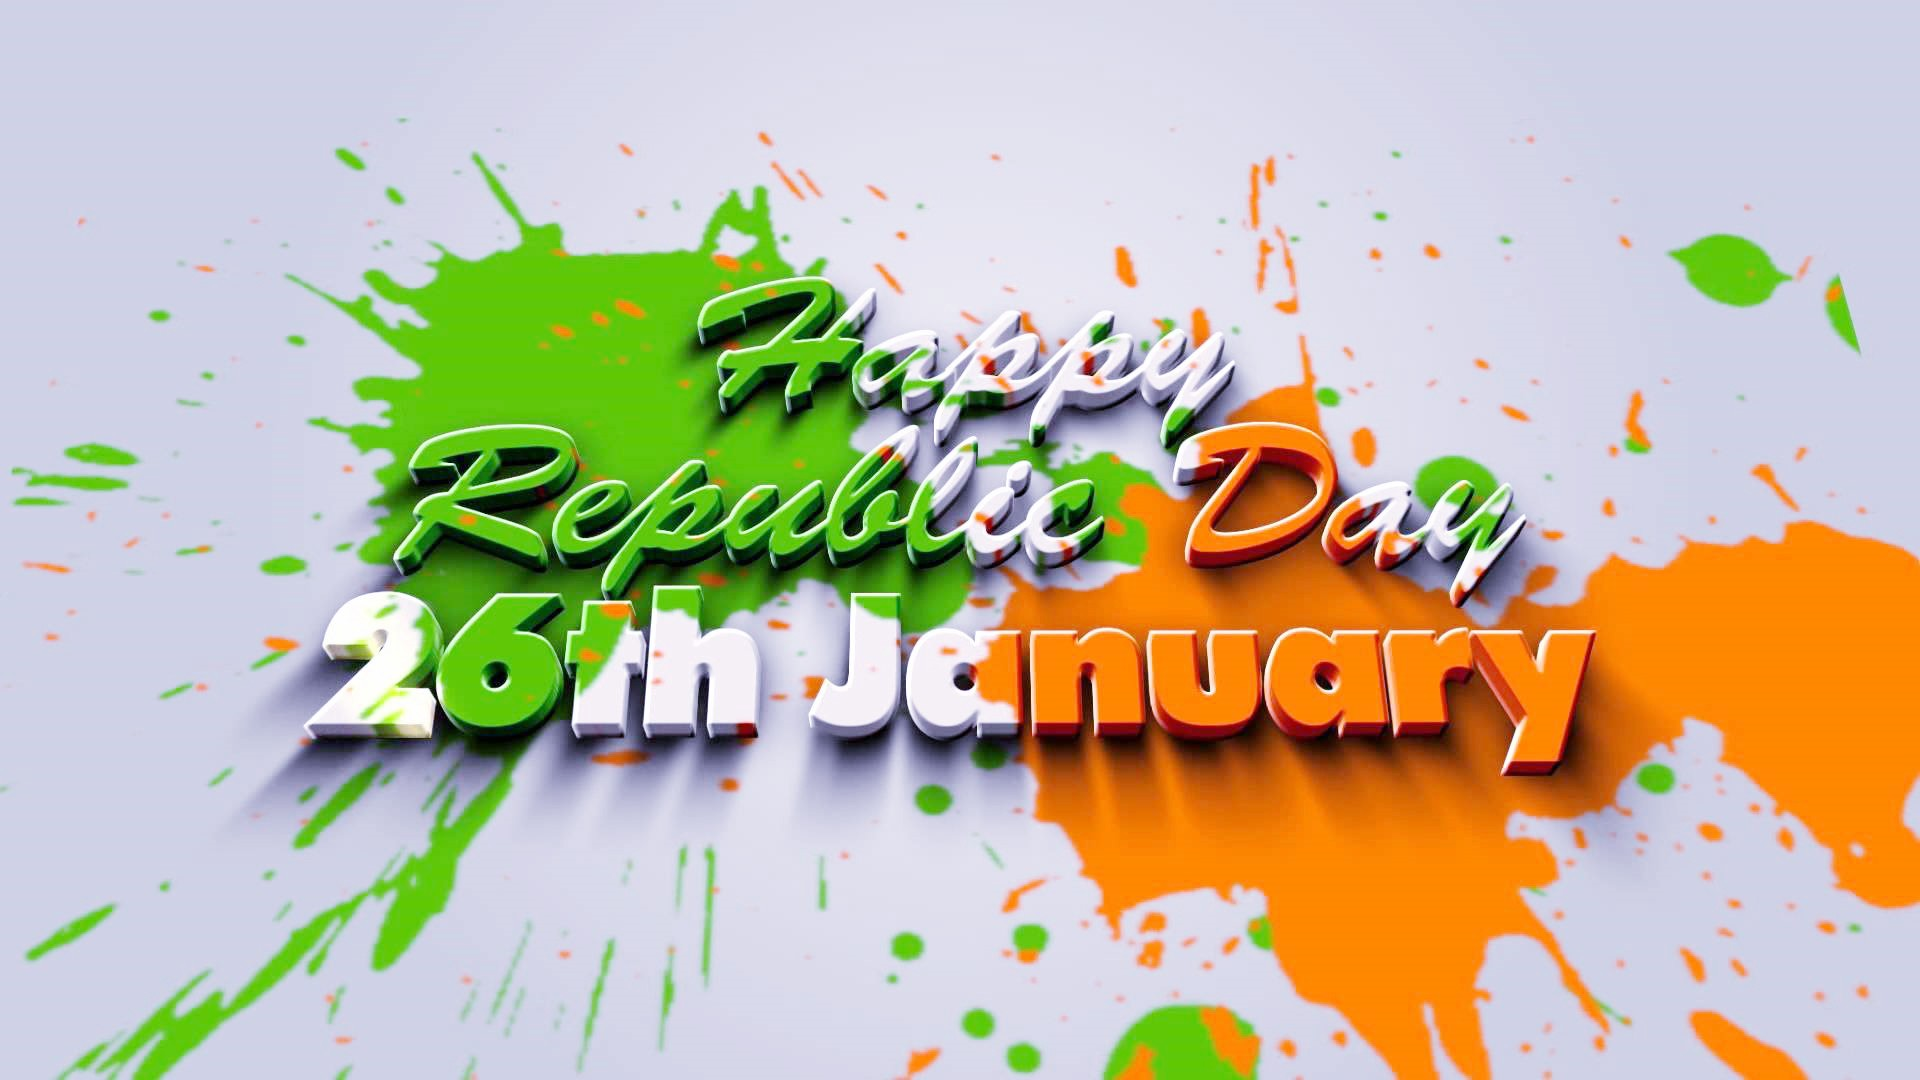 Happy Republic Day Pics, Images